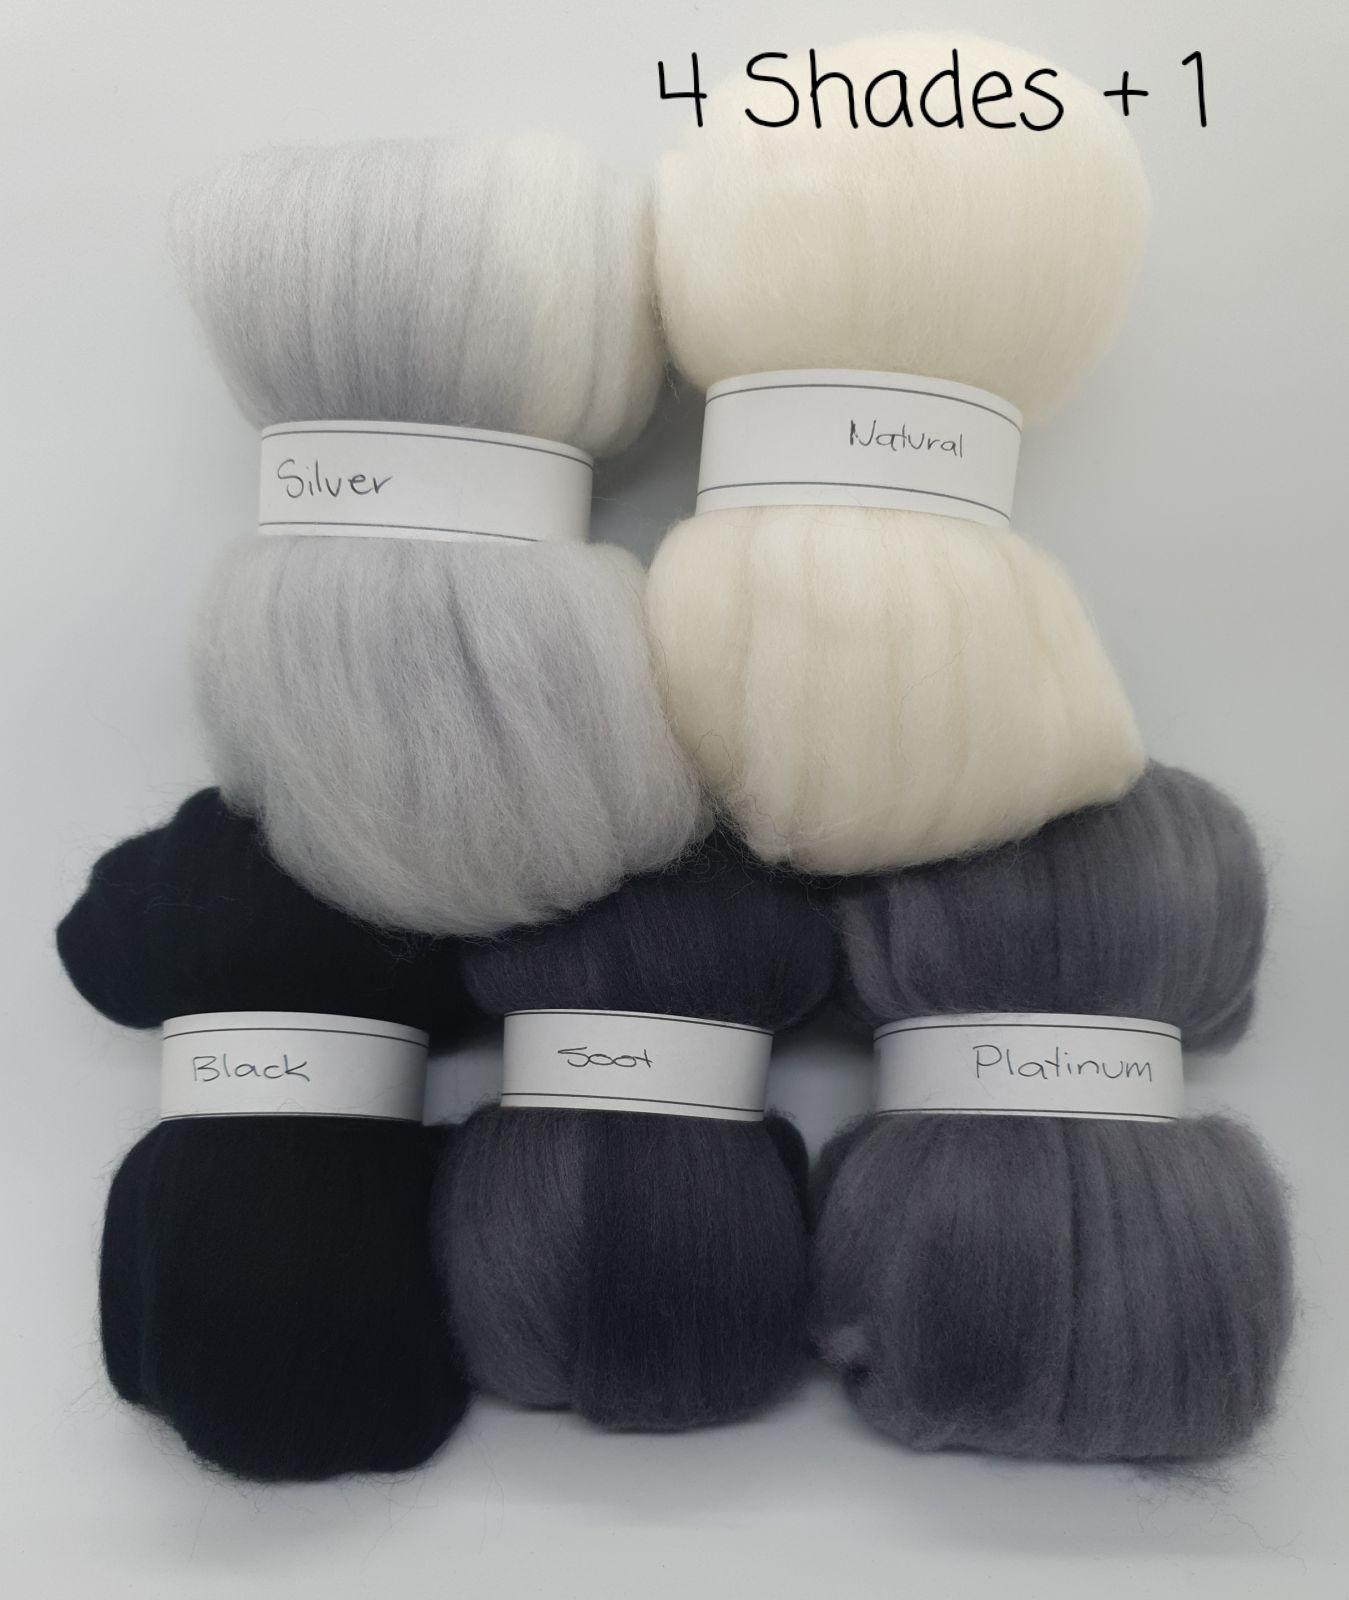 4 Shades of Grey plus 1